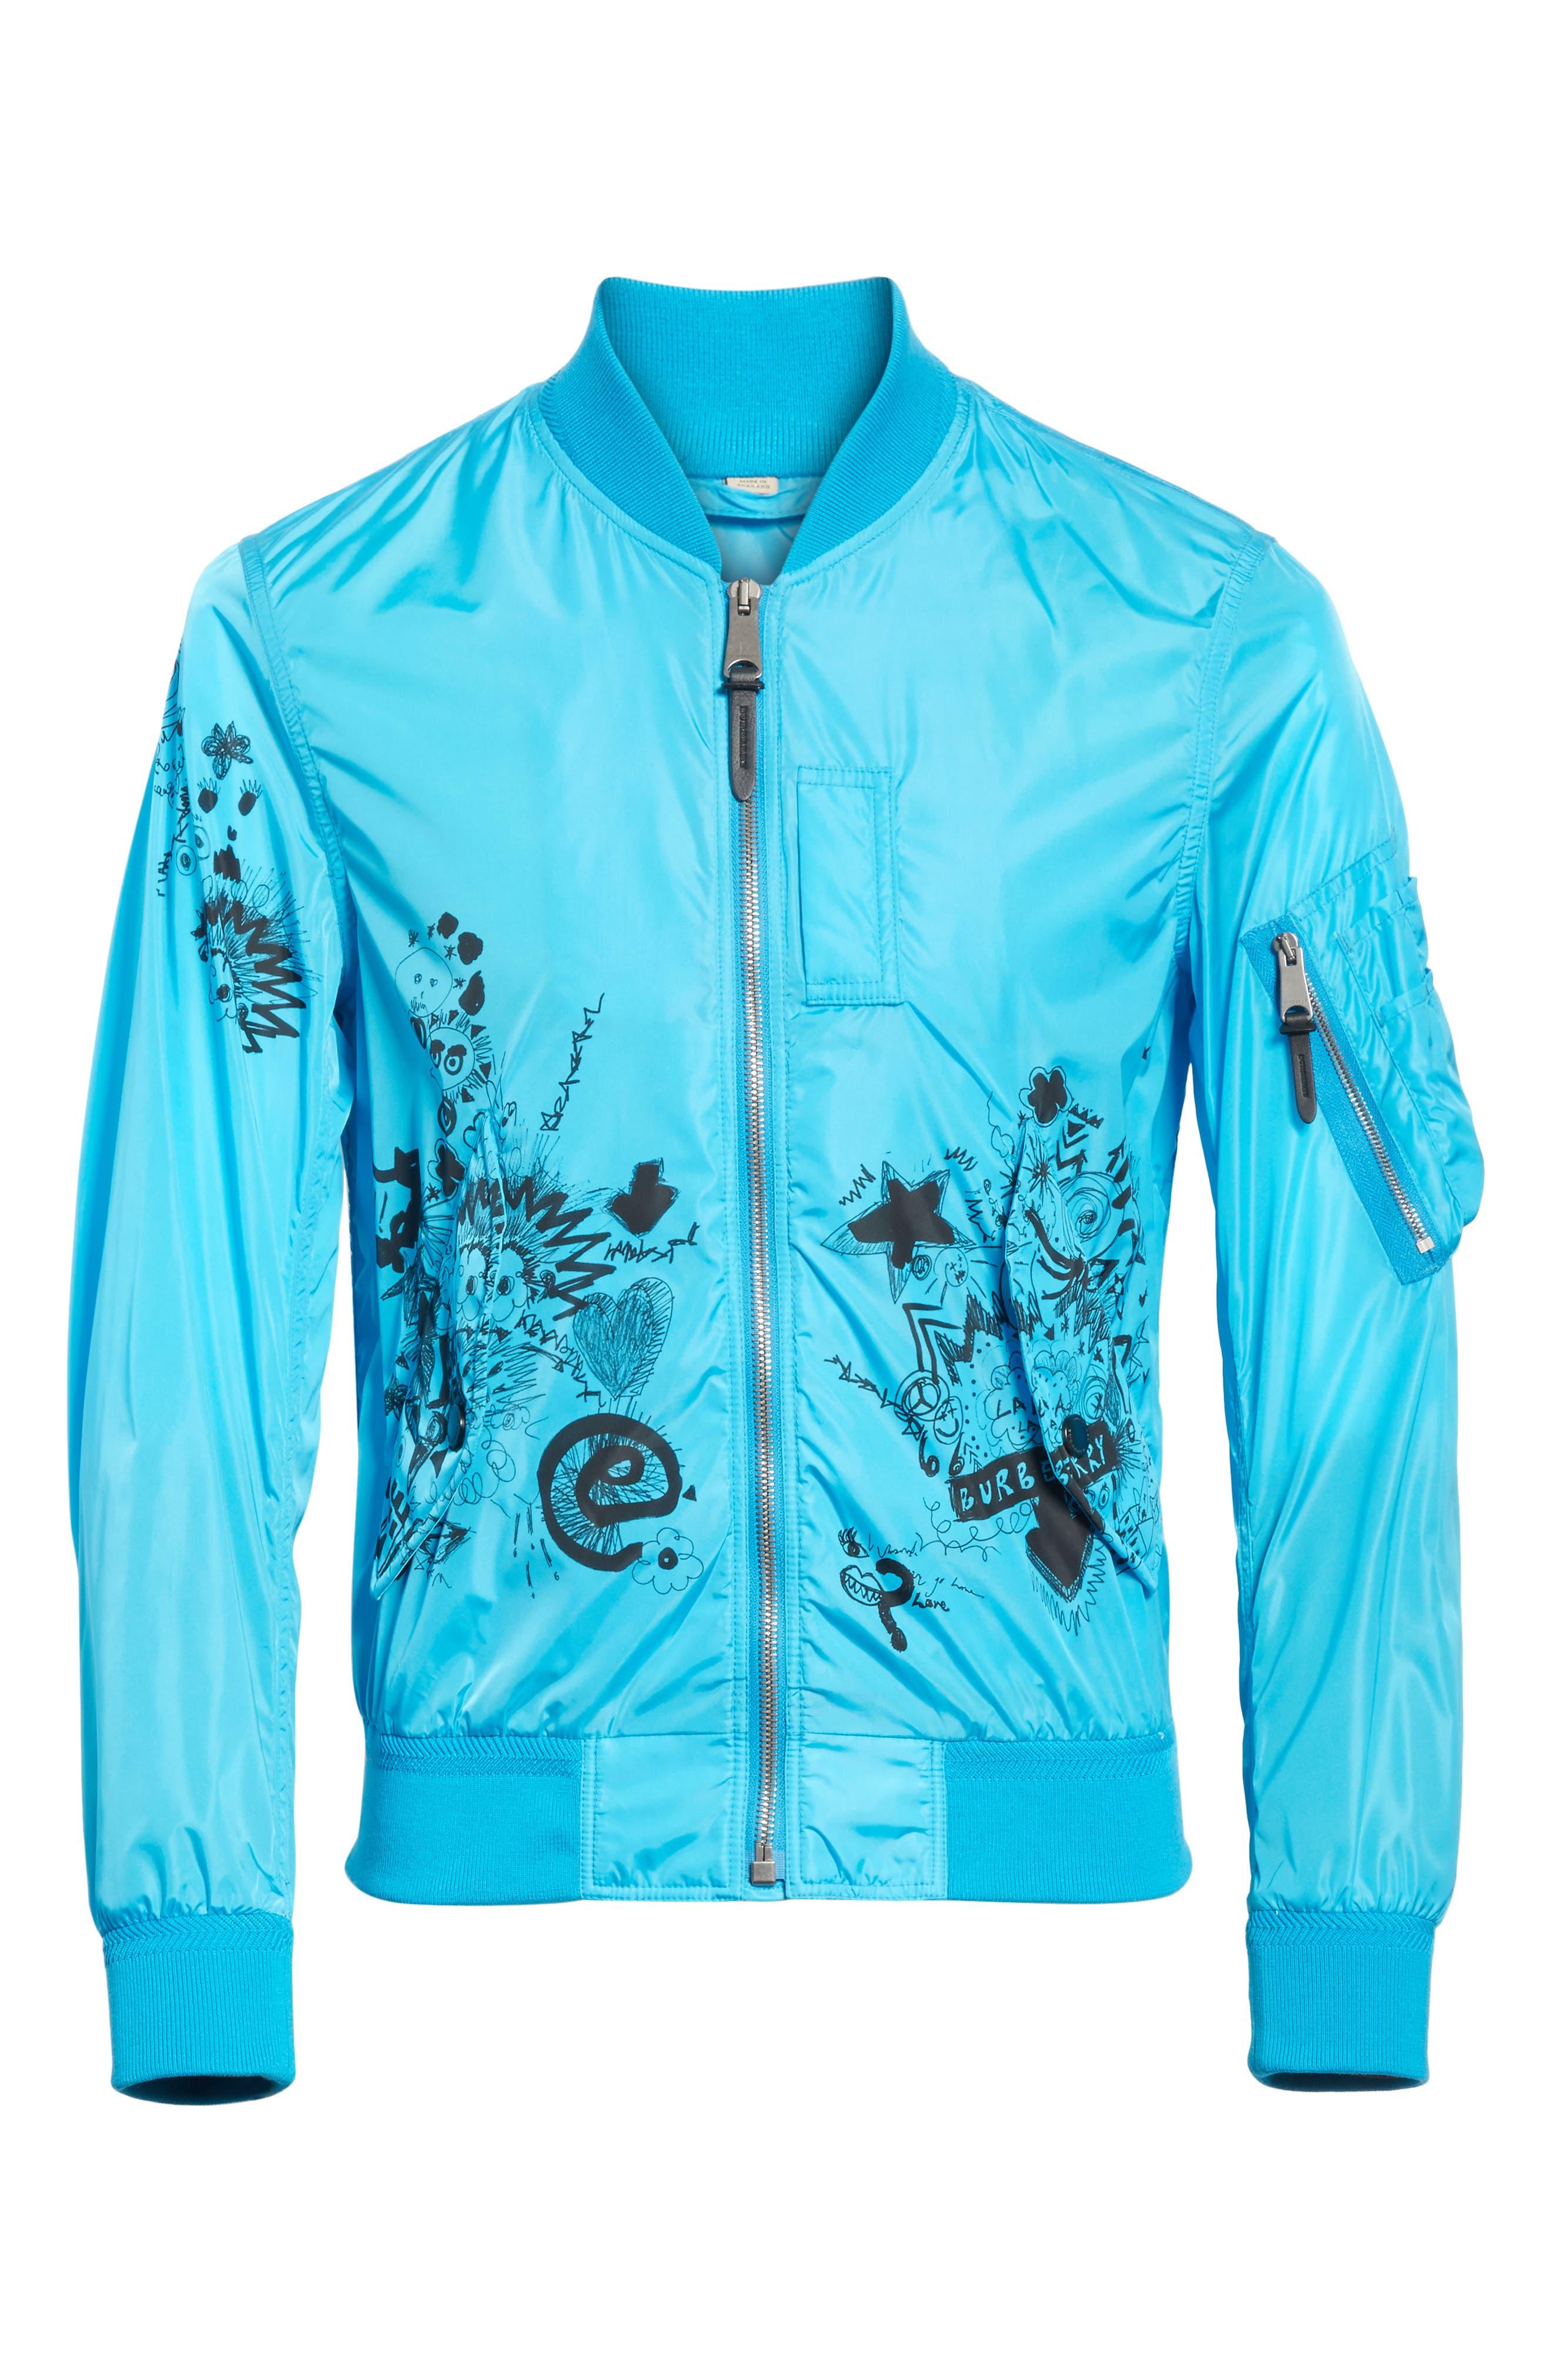 Brinkley Standard Fit Jacket,                             Alternate thumbnail 6, color,                             Bright Blue